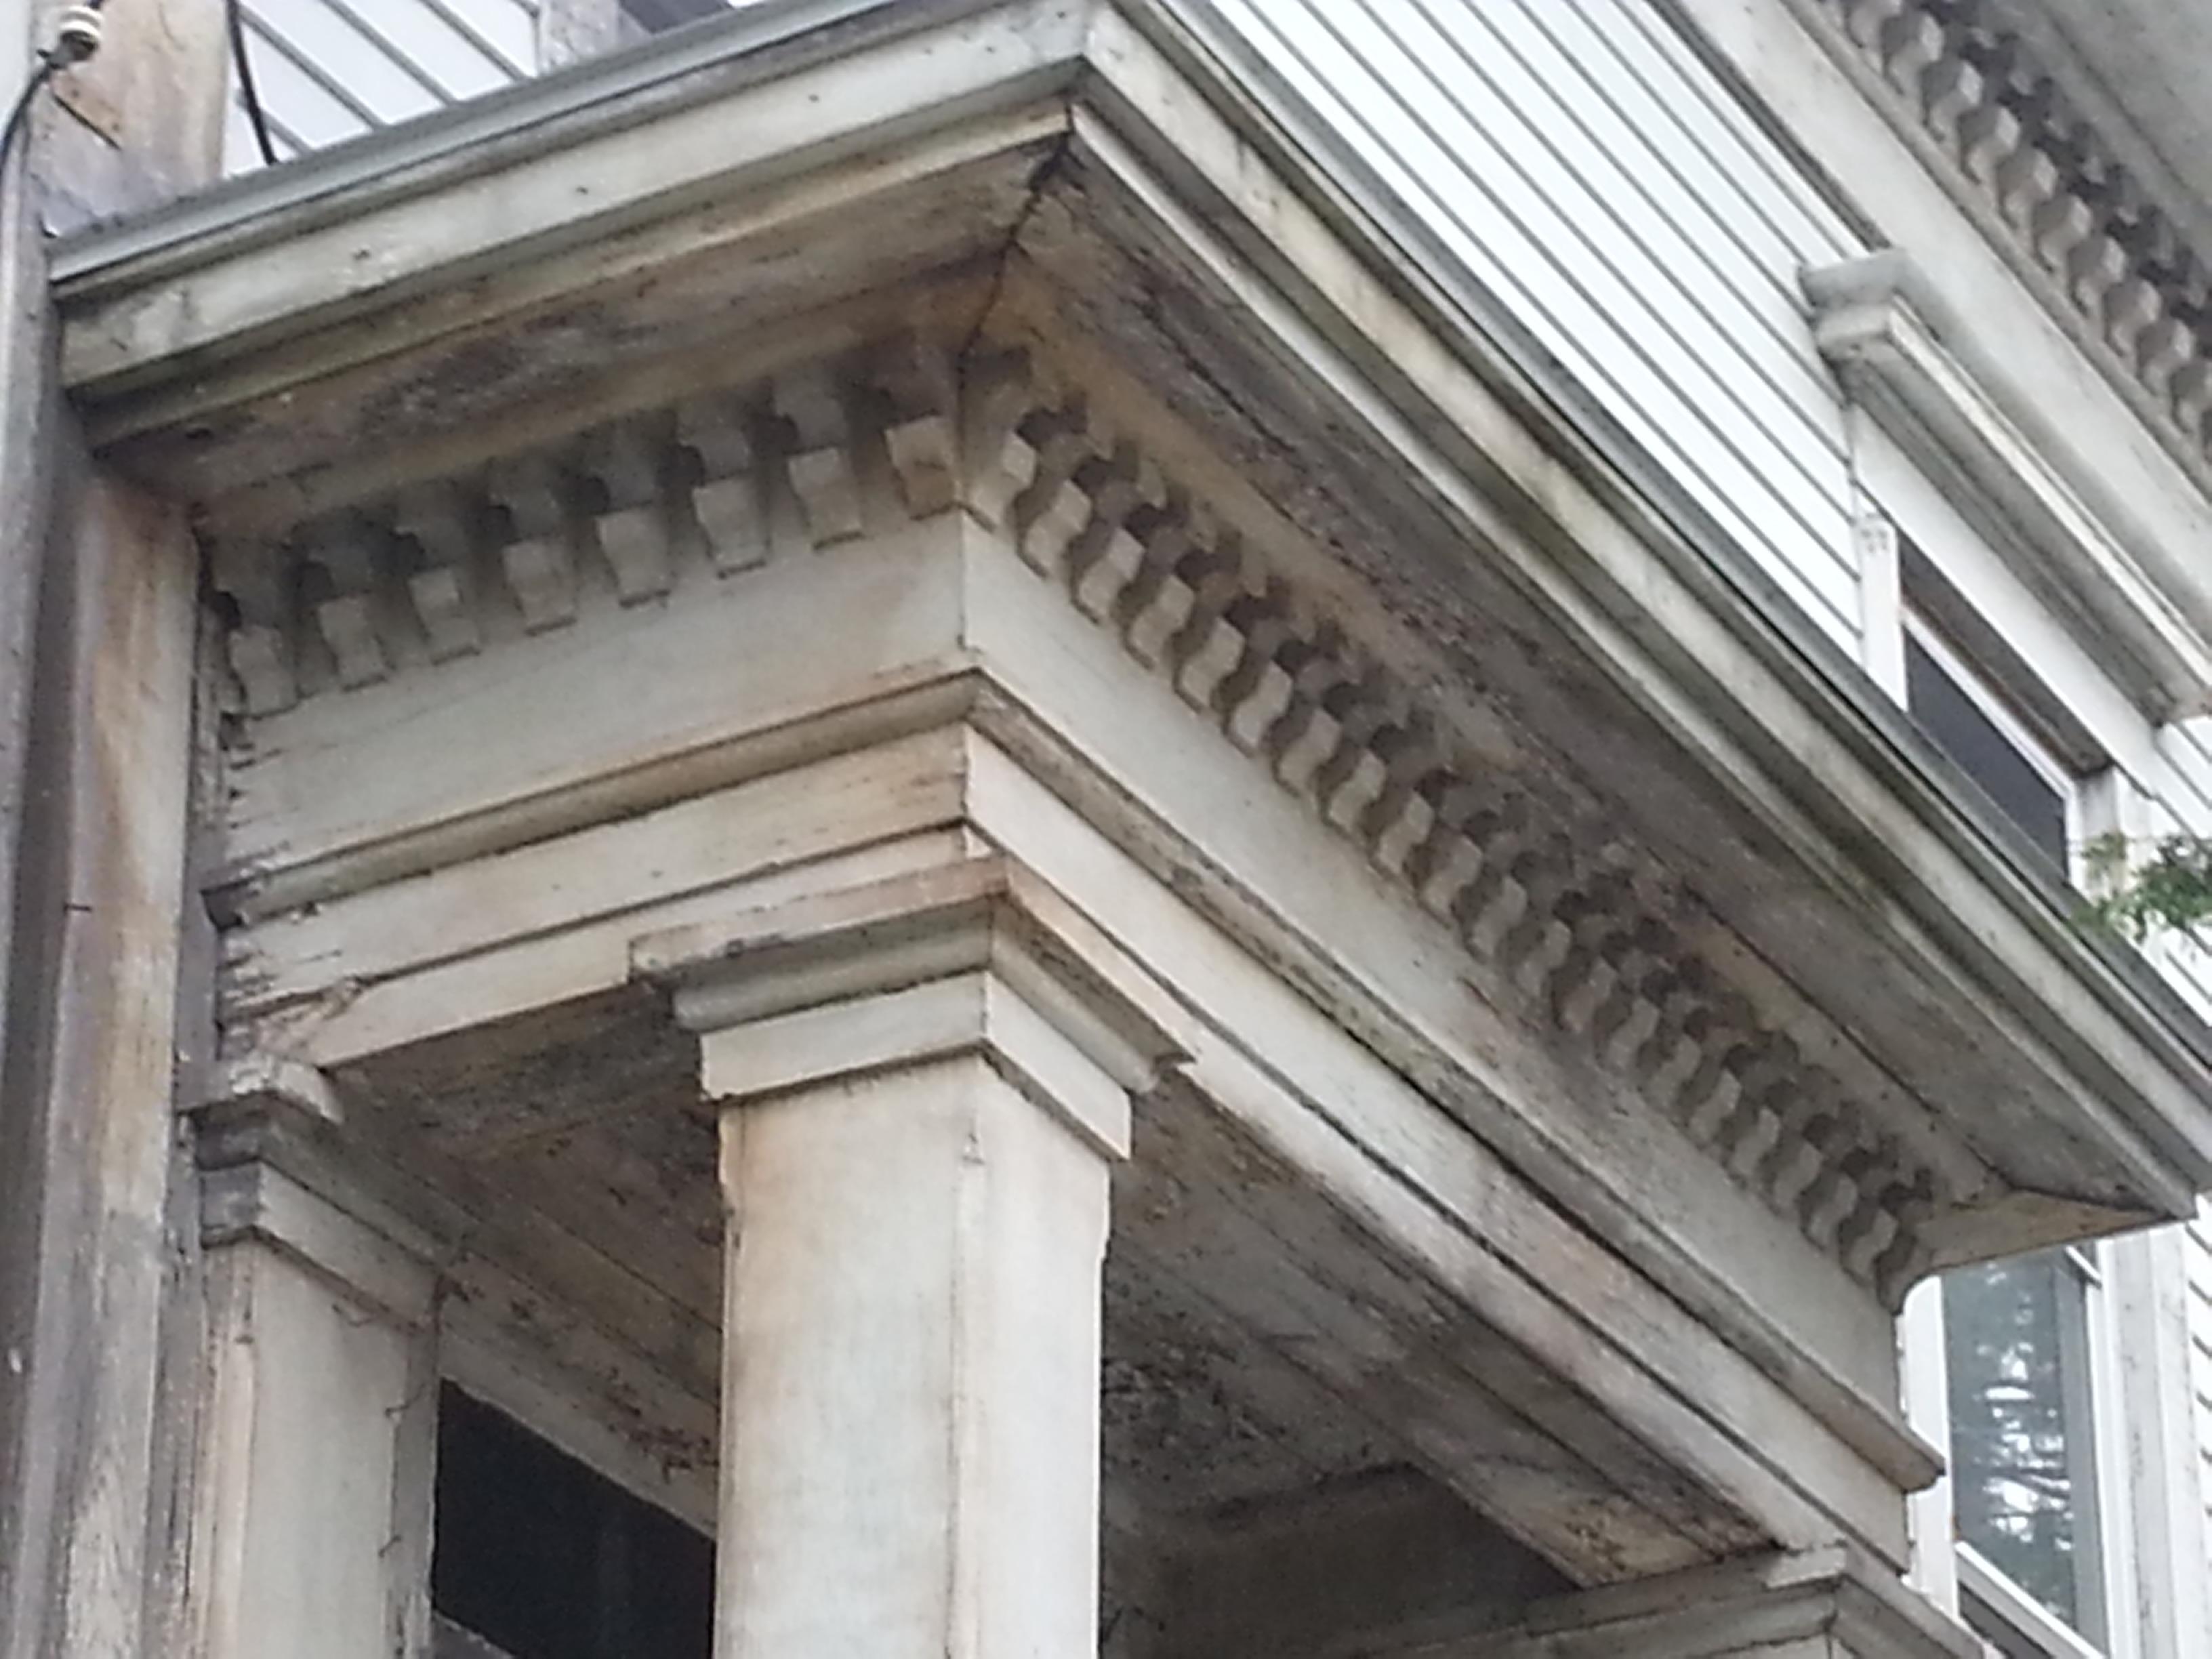 Architectural Dentil Trim : Off washington the architectural details of bath maine